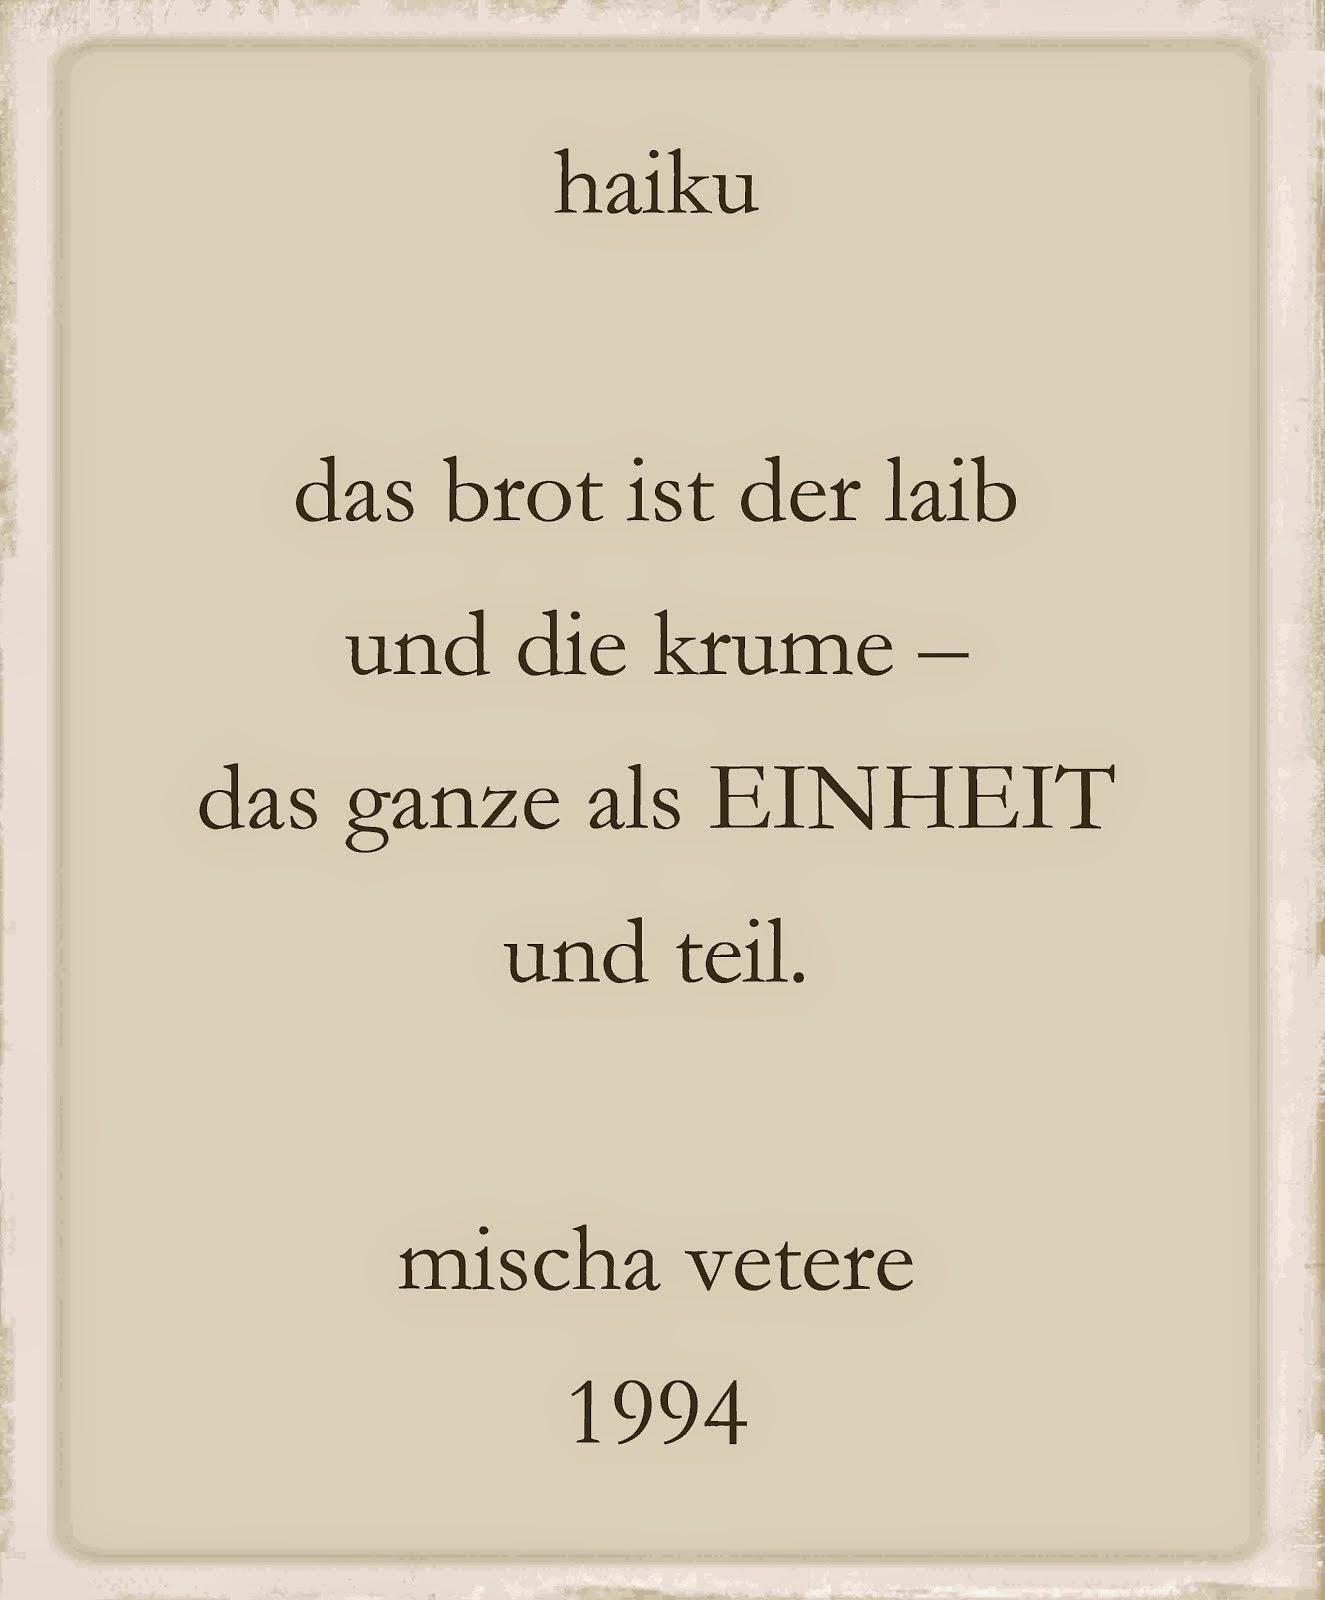 haiku 1994 von mischa vetere brot laib krume erika burkart DER HAIKU-SCHREIBER ira cohen RIMBAUD